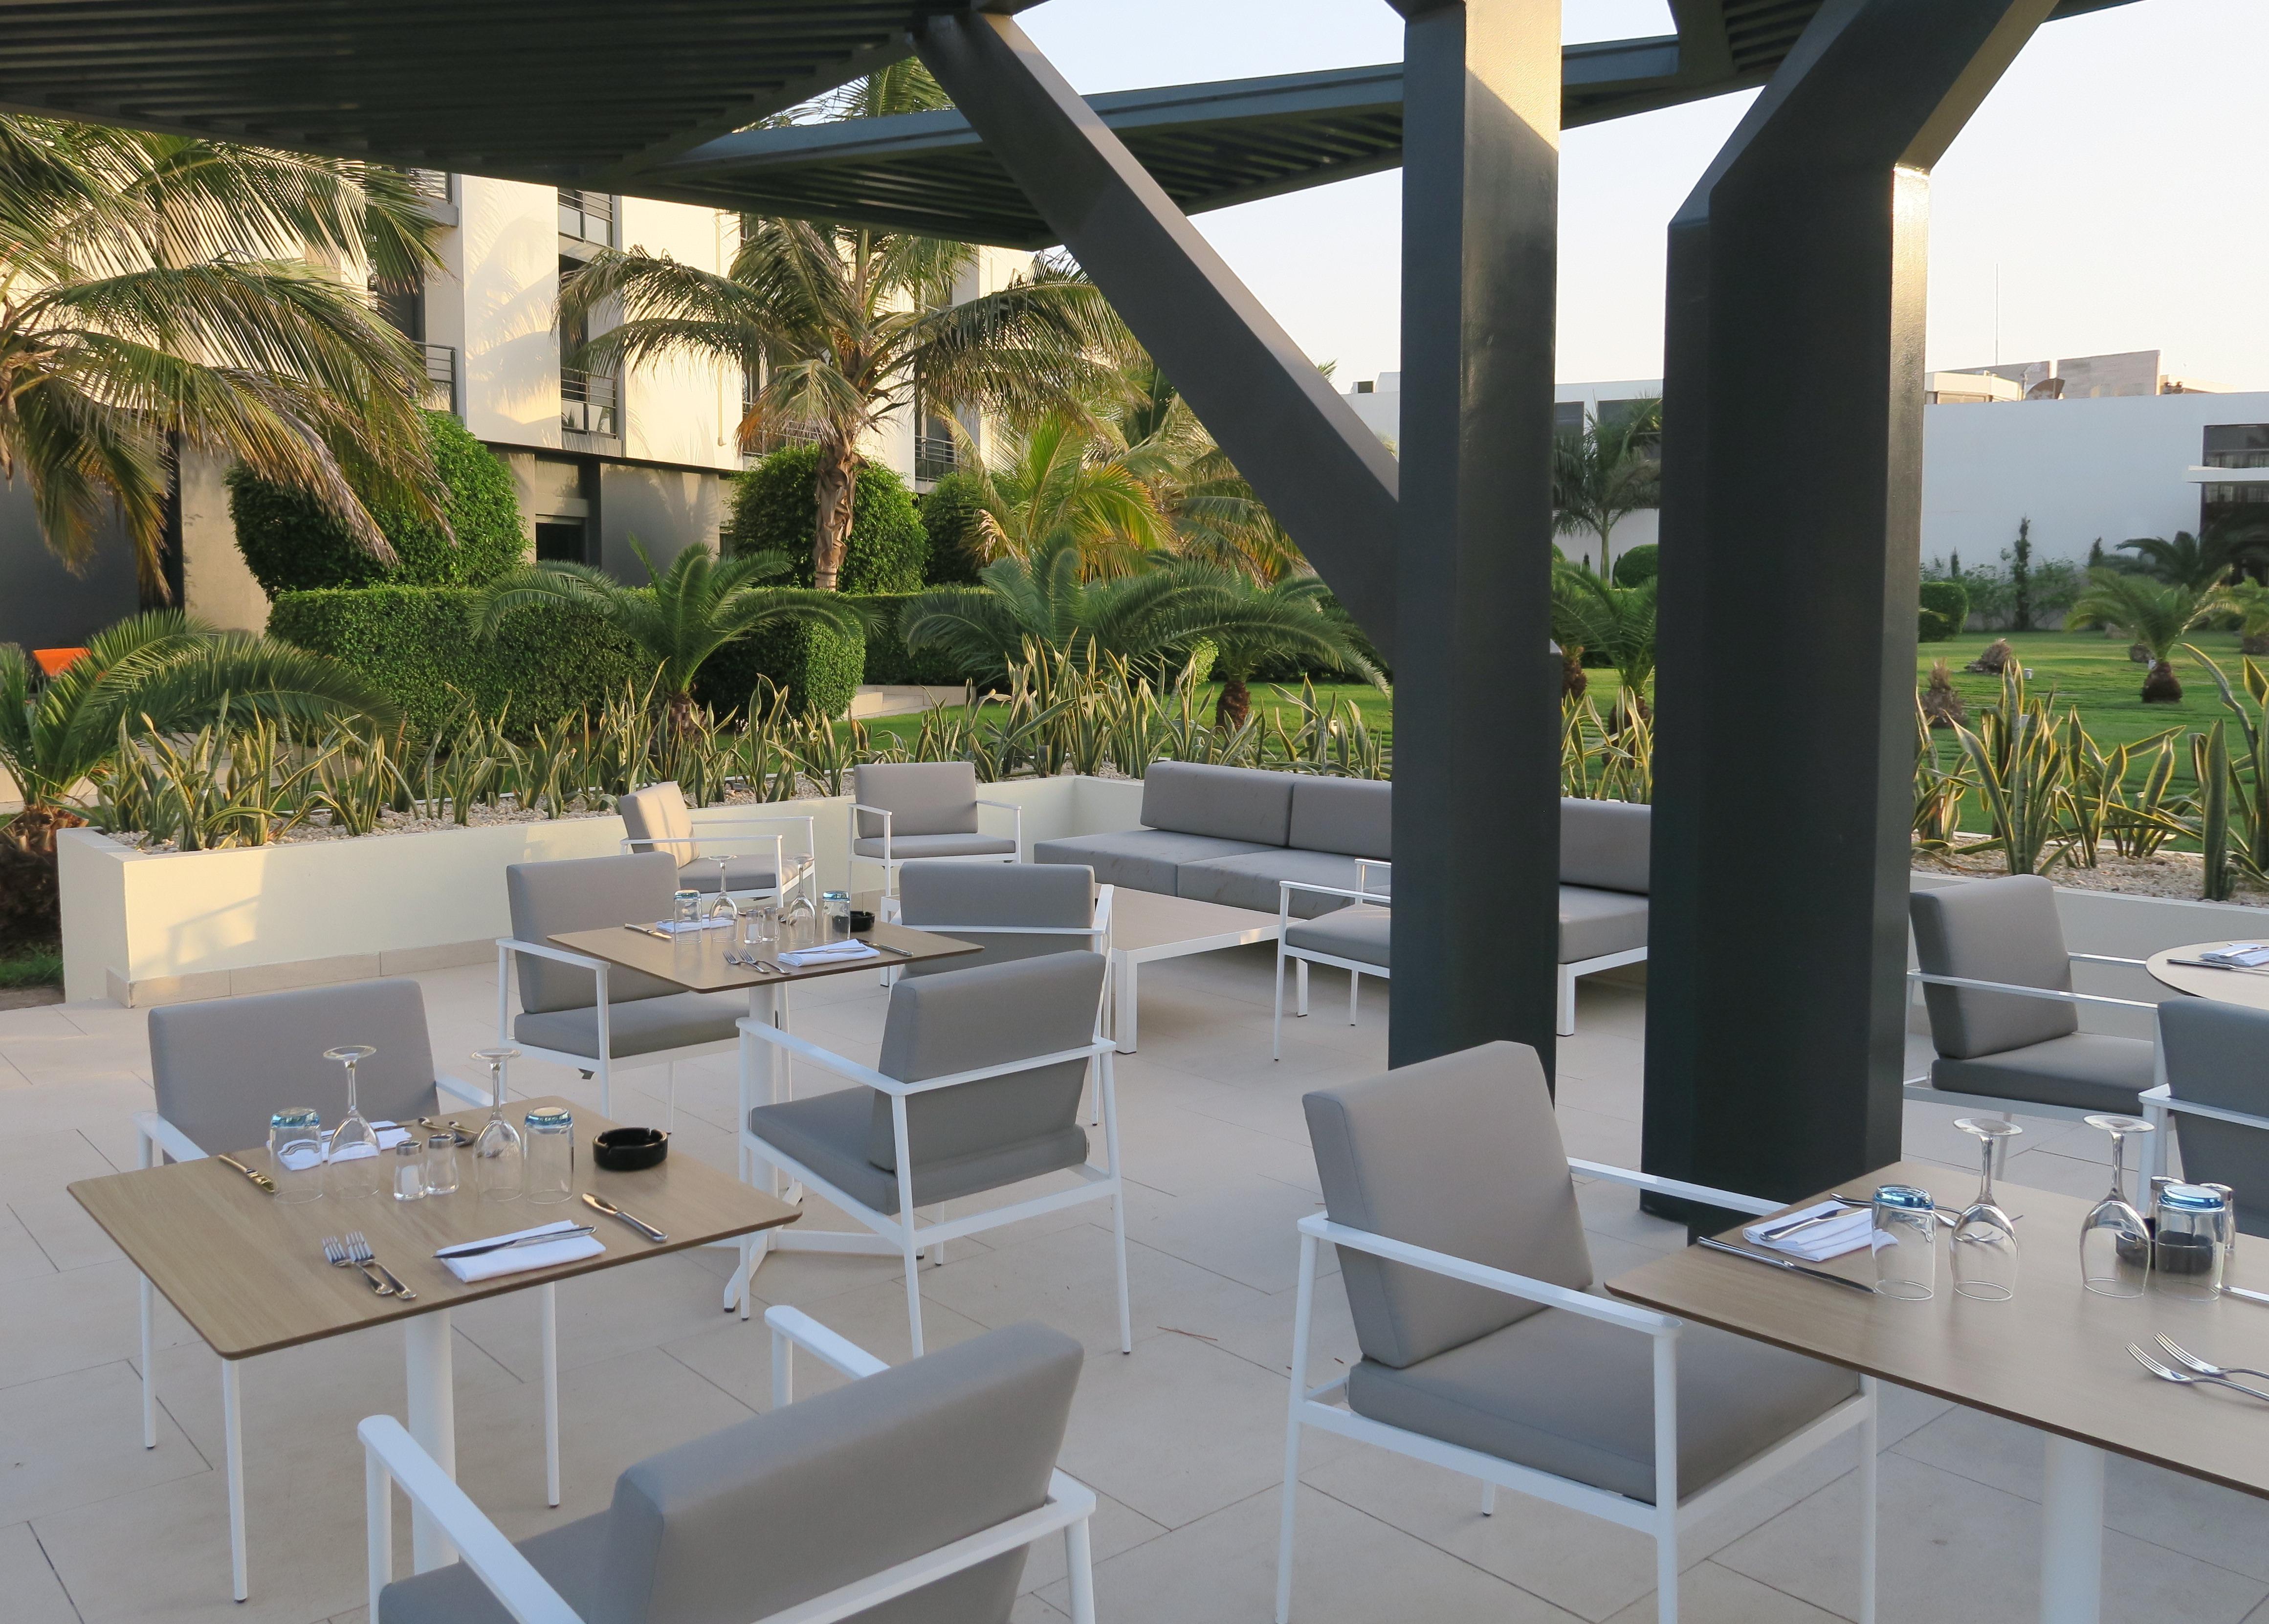 dakar bivaq outdoor furniture hotel radisson blu africa beach resort